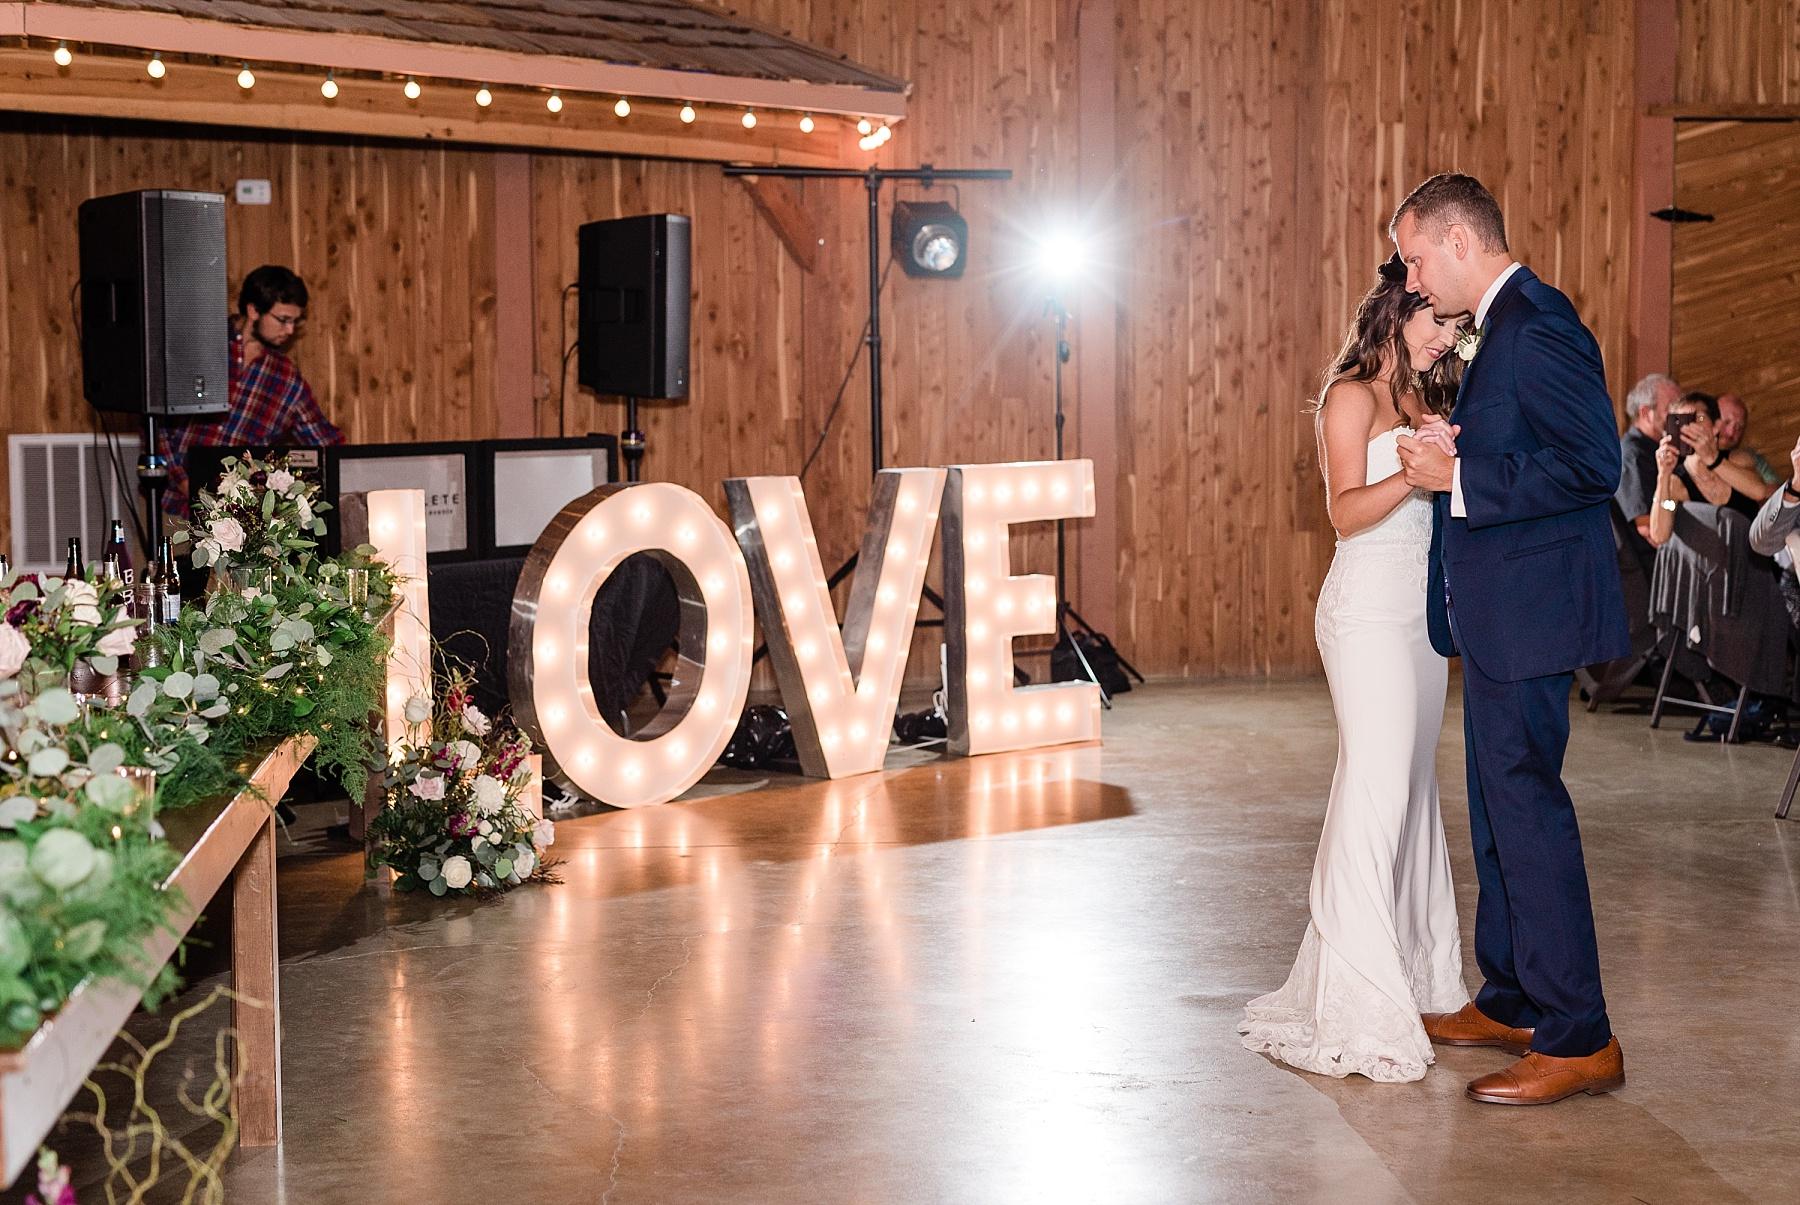 Romantic Summer Sunset Wedding Ceremony at Little Piney Lodge St. Louis Missouri by Kelsi Kliethermes Photography Fine Art Photographer_0021.jpg